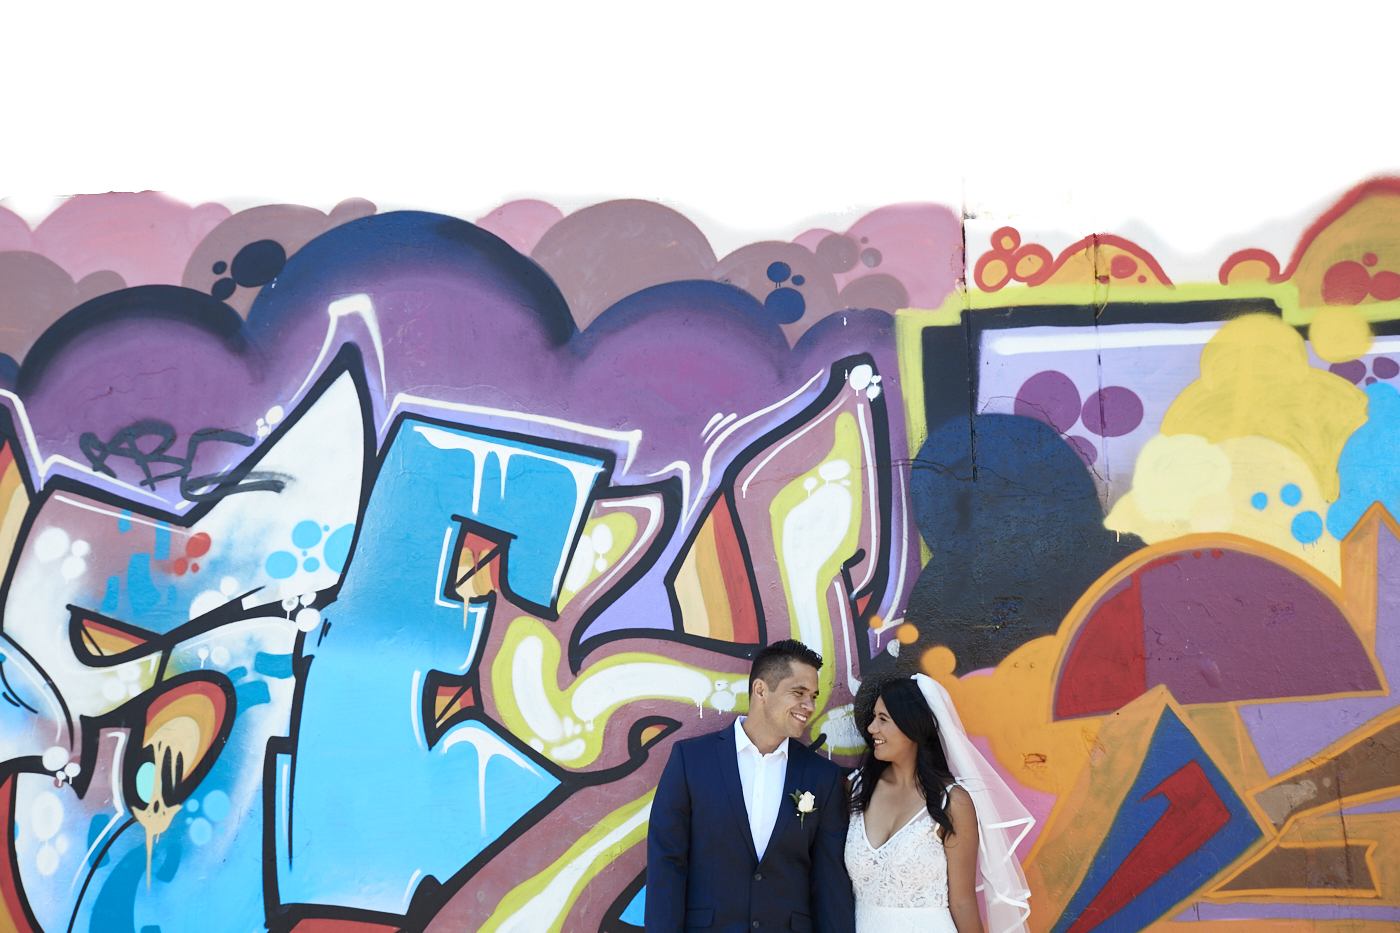 graffiti wall backdrop for wedding